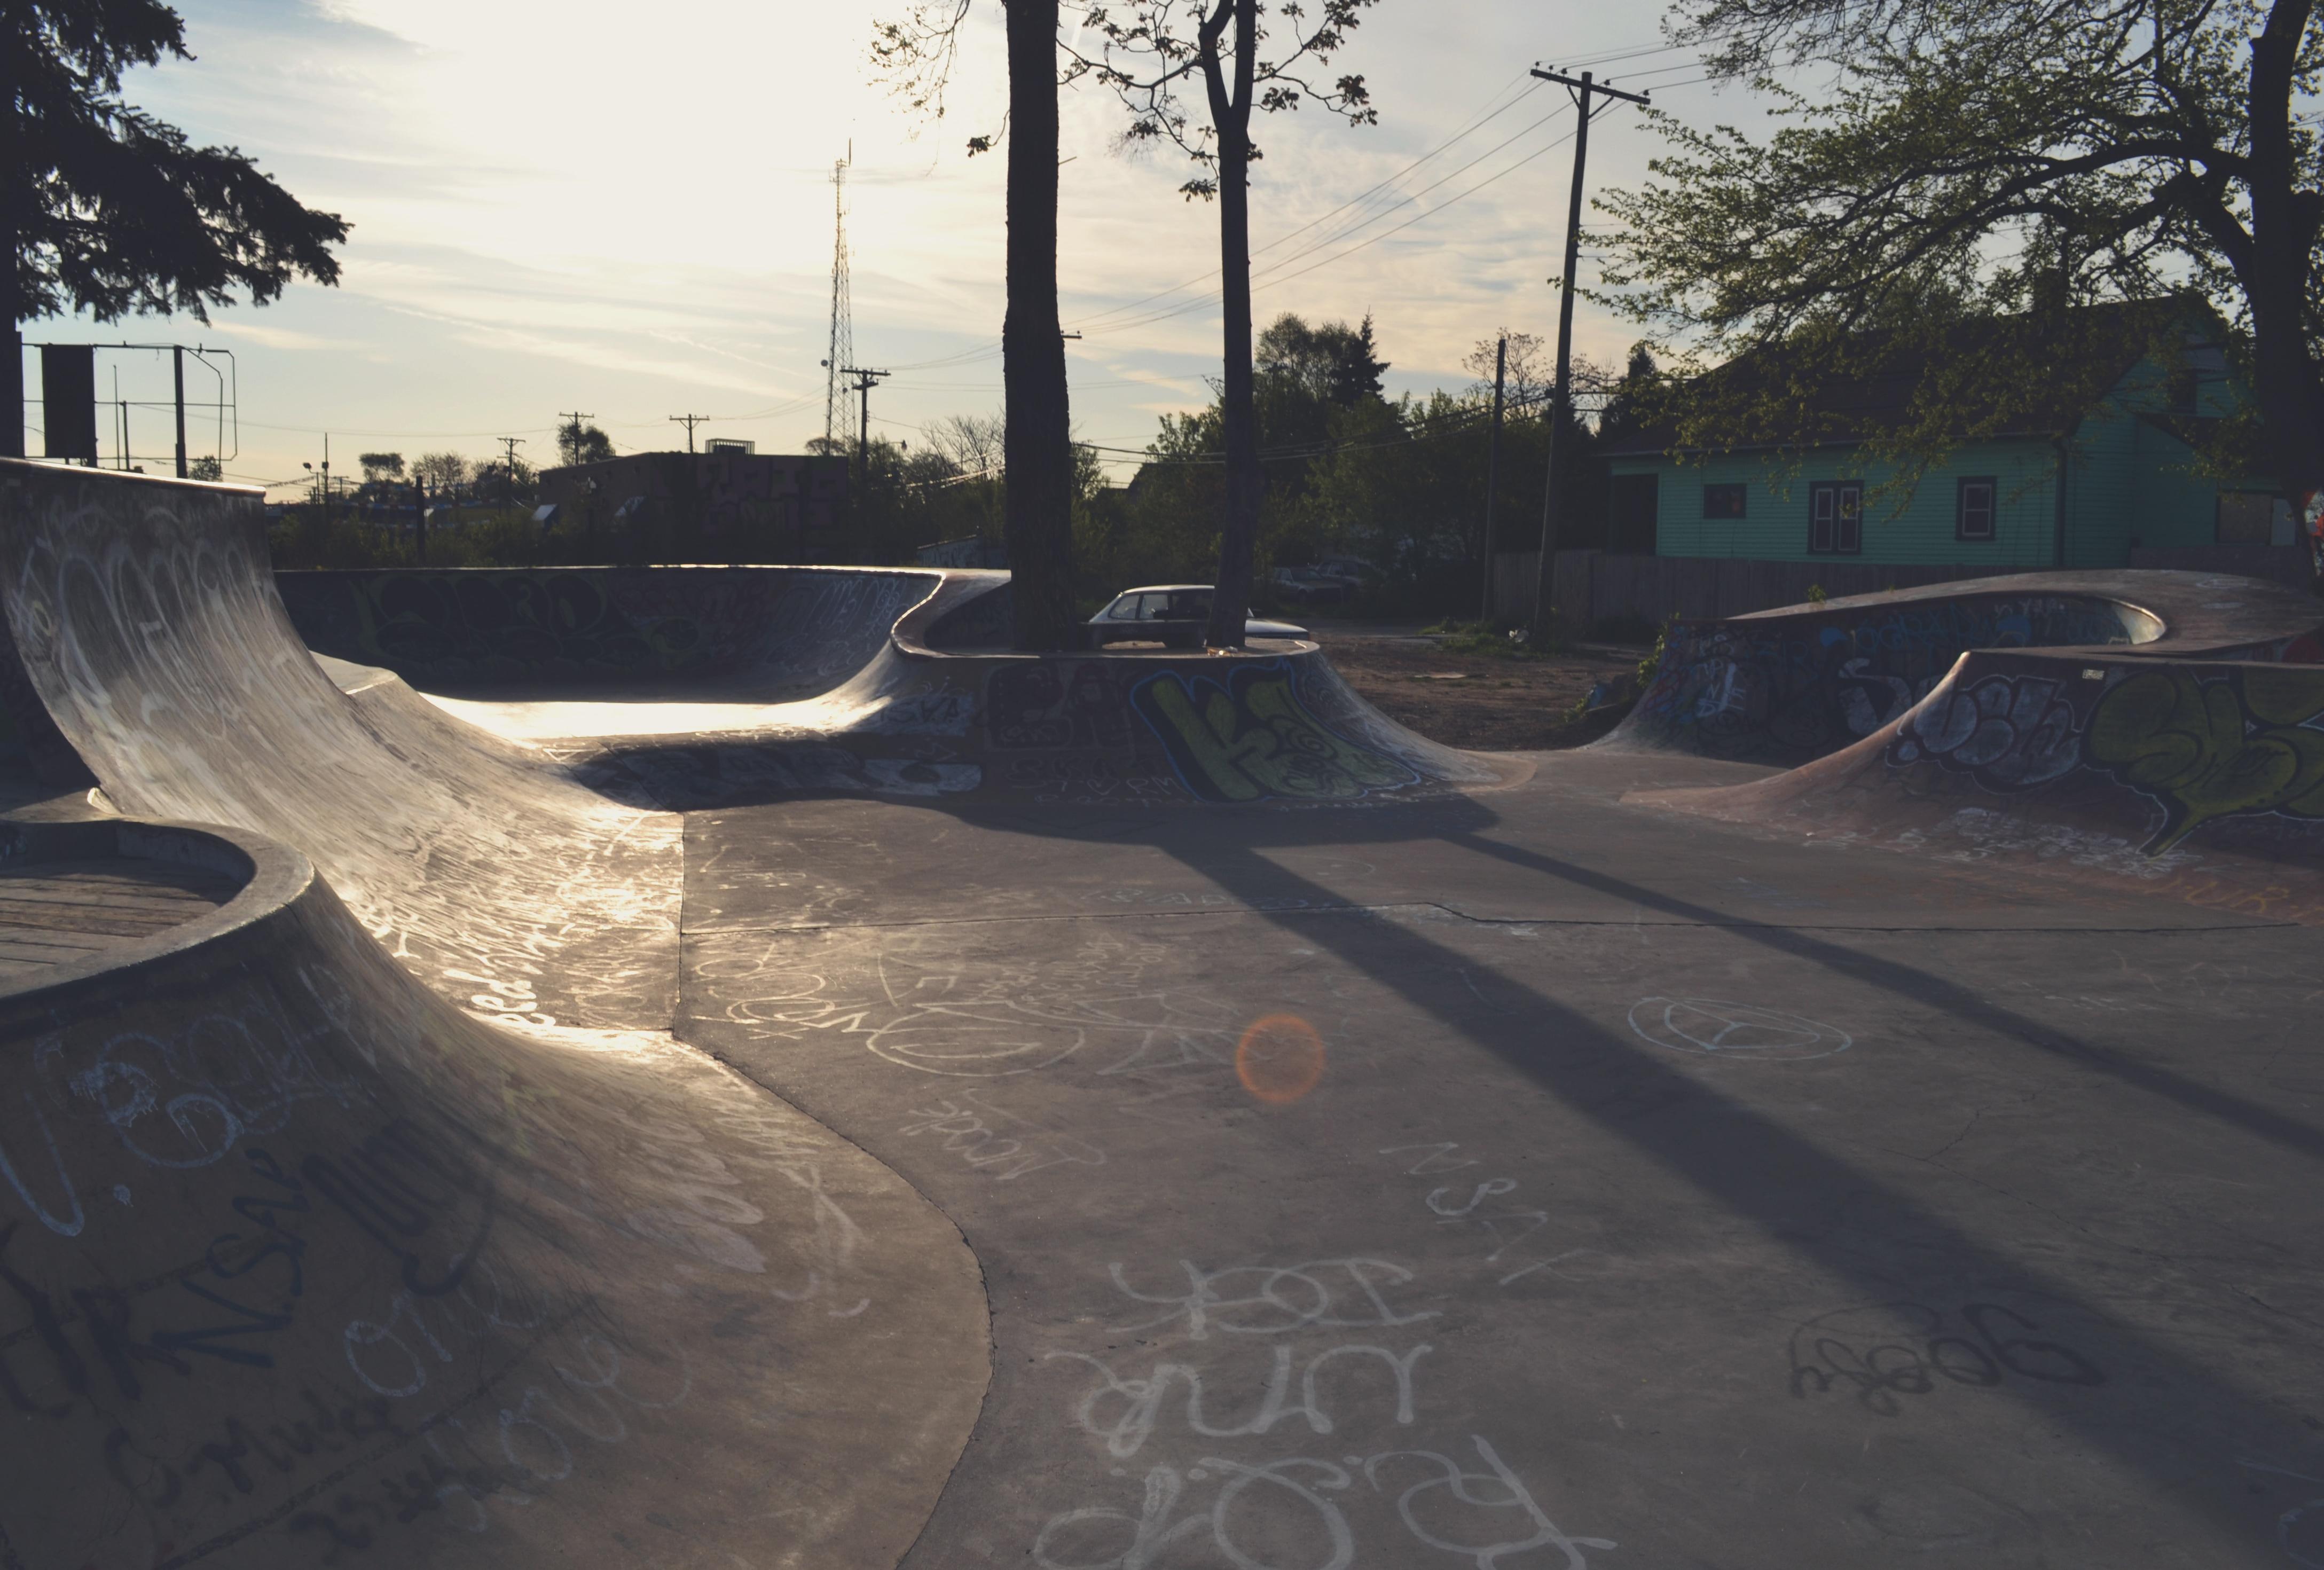 skate park image Peakpx 4352x2940